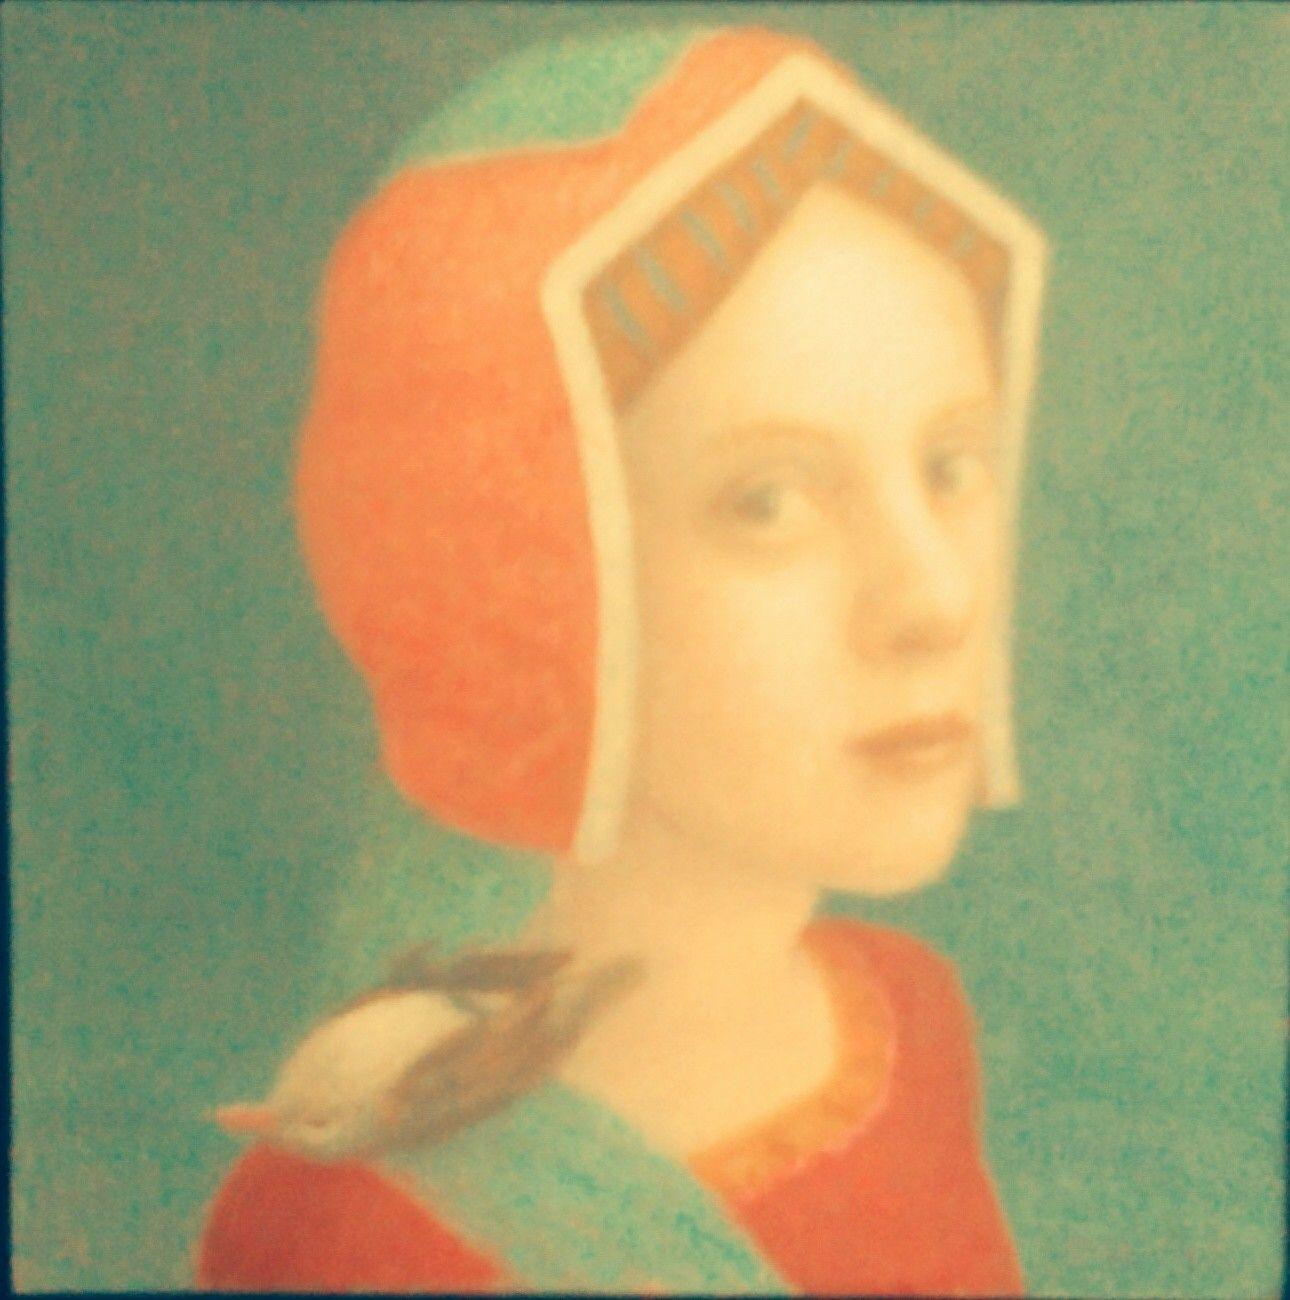 A painting by Marieloes Reek, dutch artist.